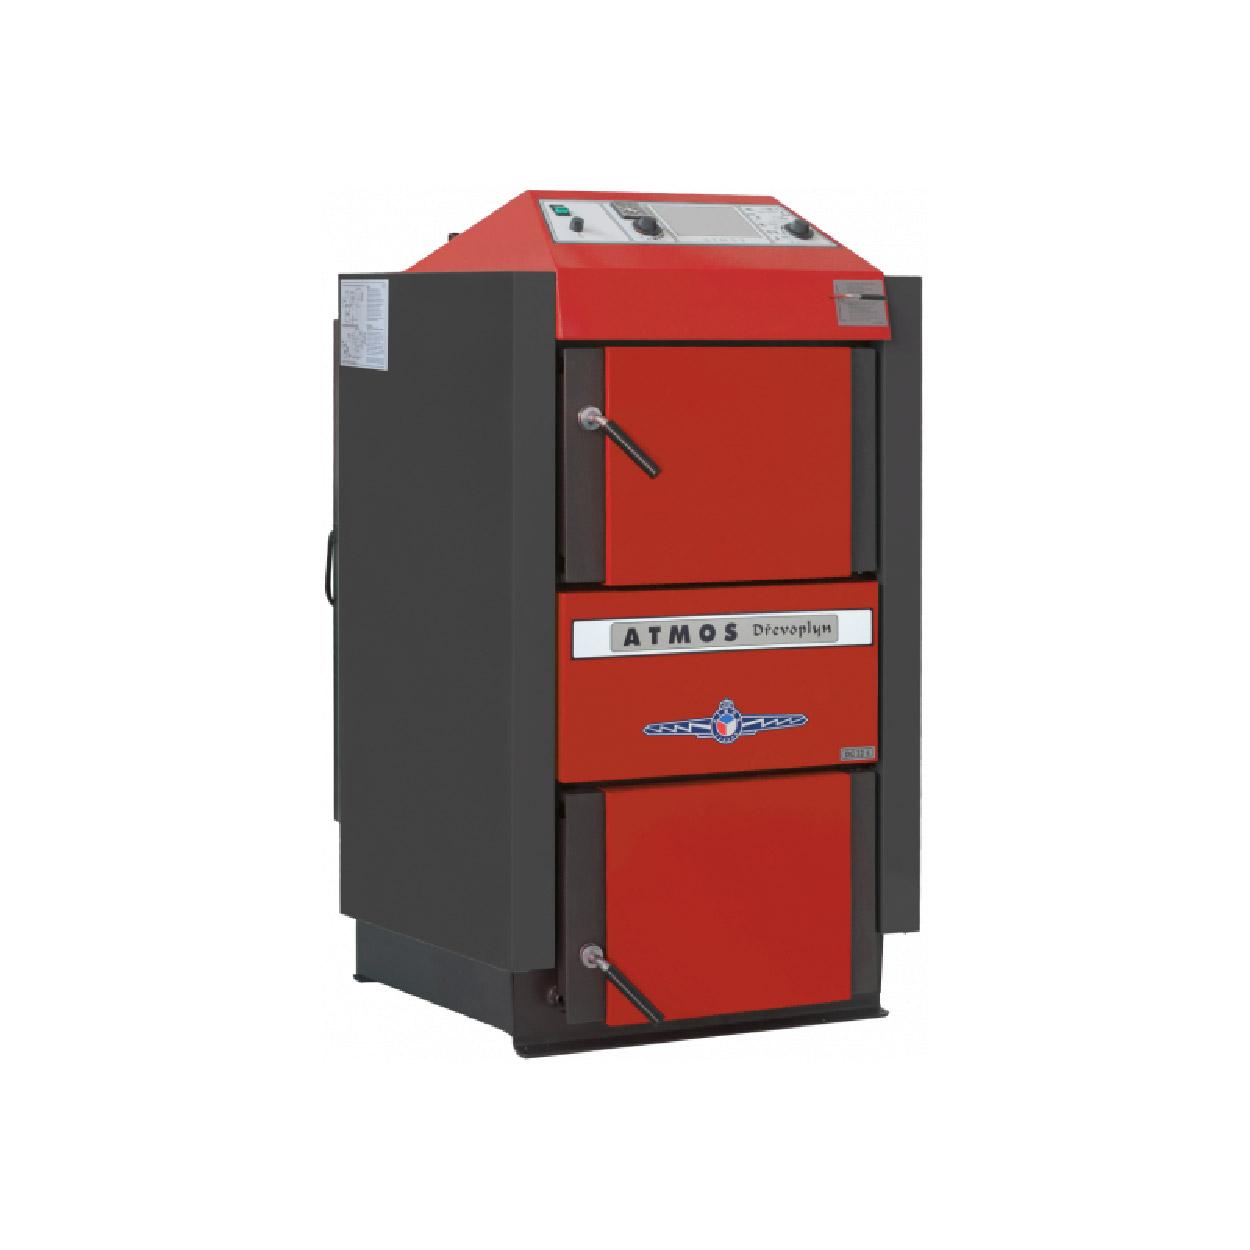 Centrala termica pe lemne ATMOS DC32GS 32 kW fornello imagine